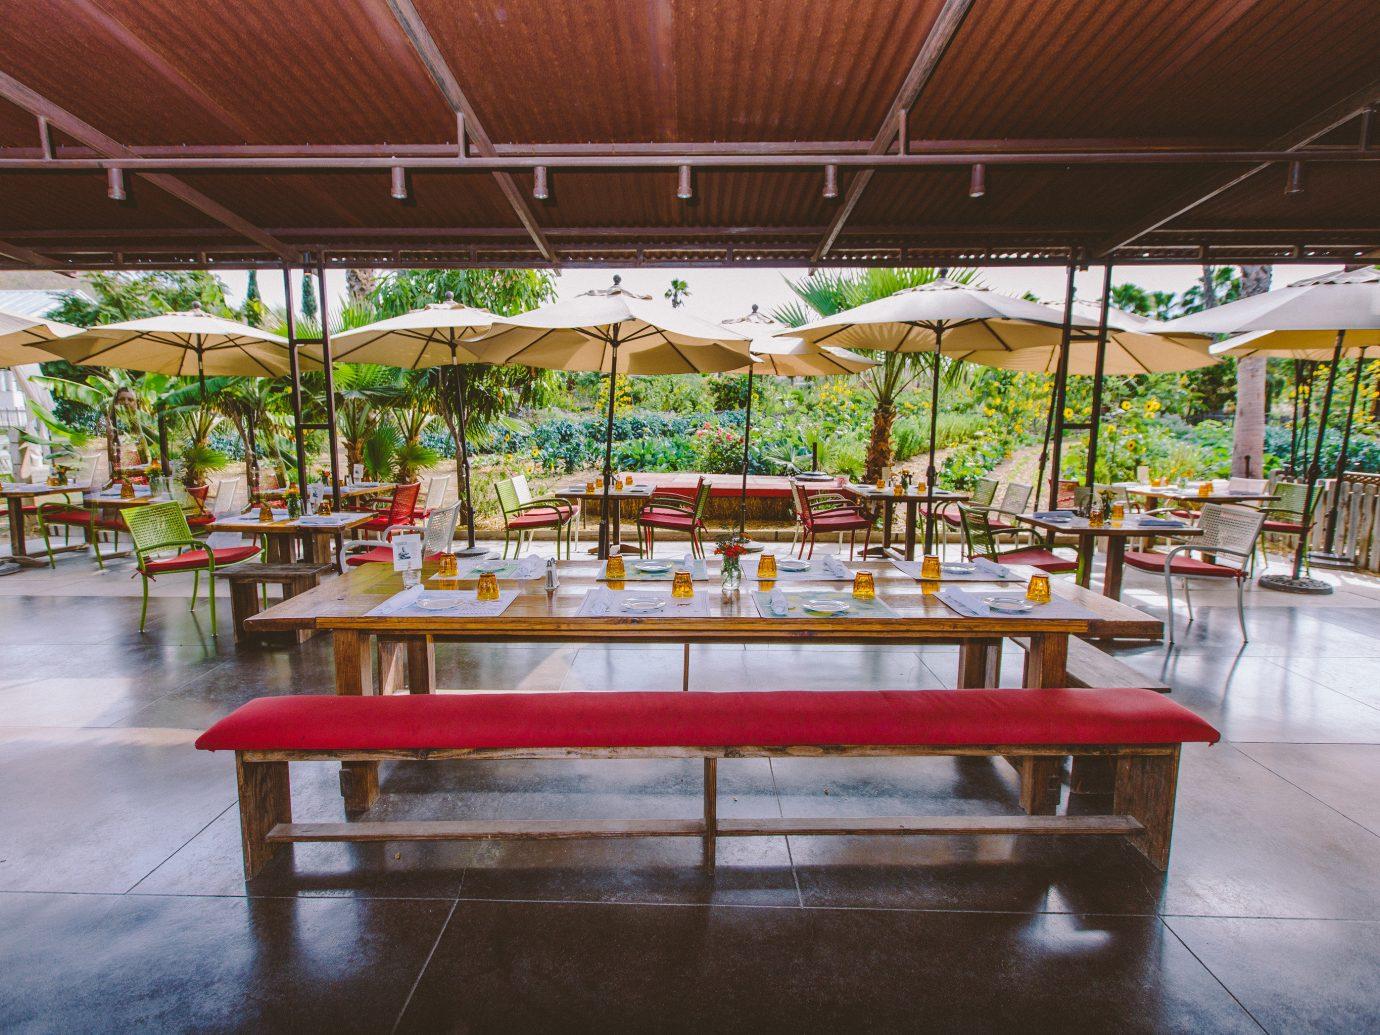 Trip Ideas table floor ground leisure chair outdoor Resort amusement park park furniture